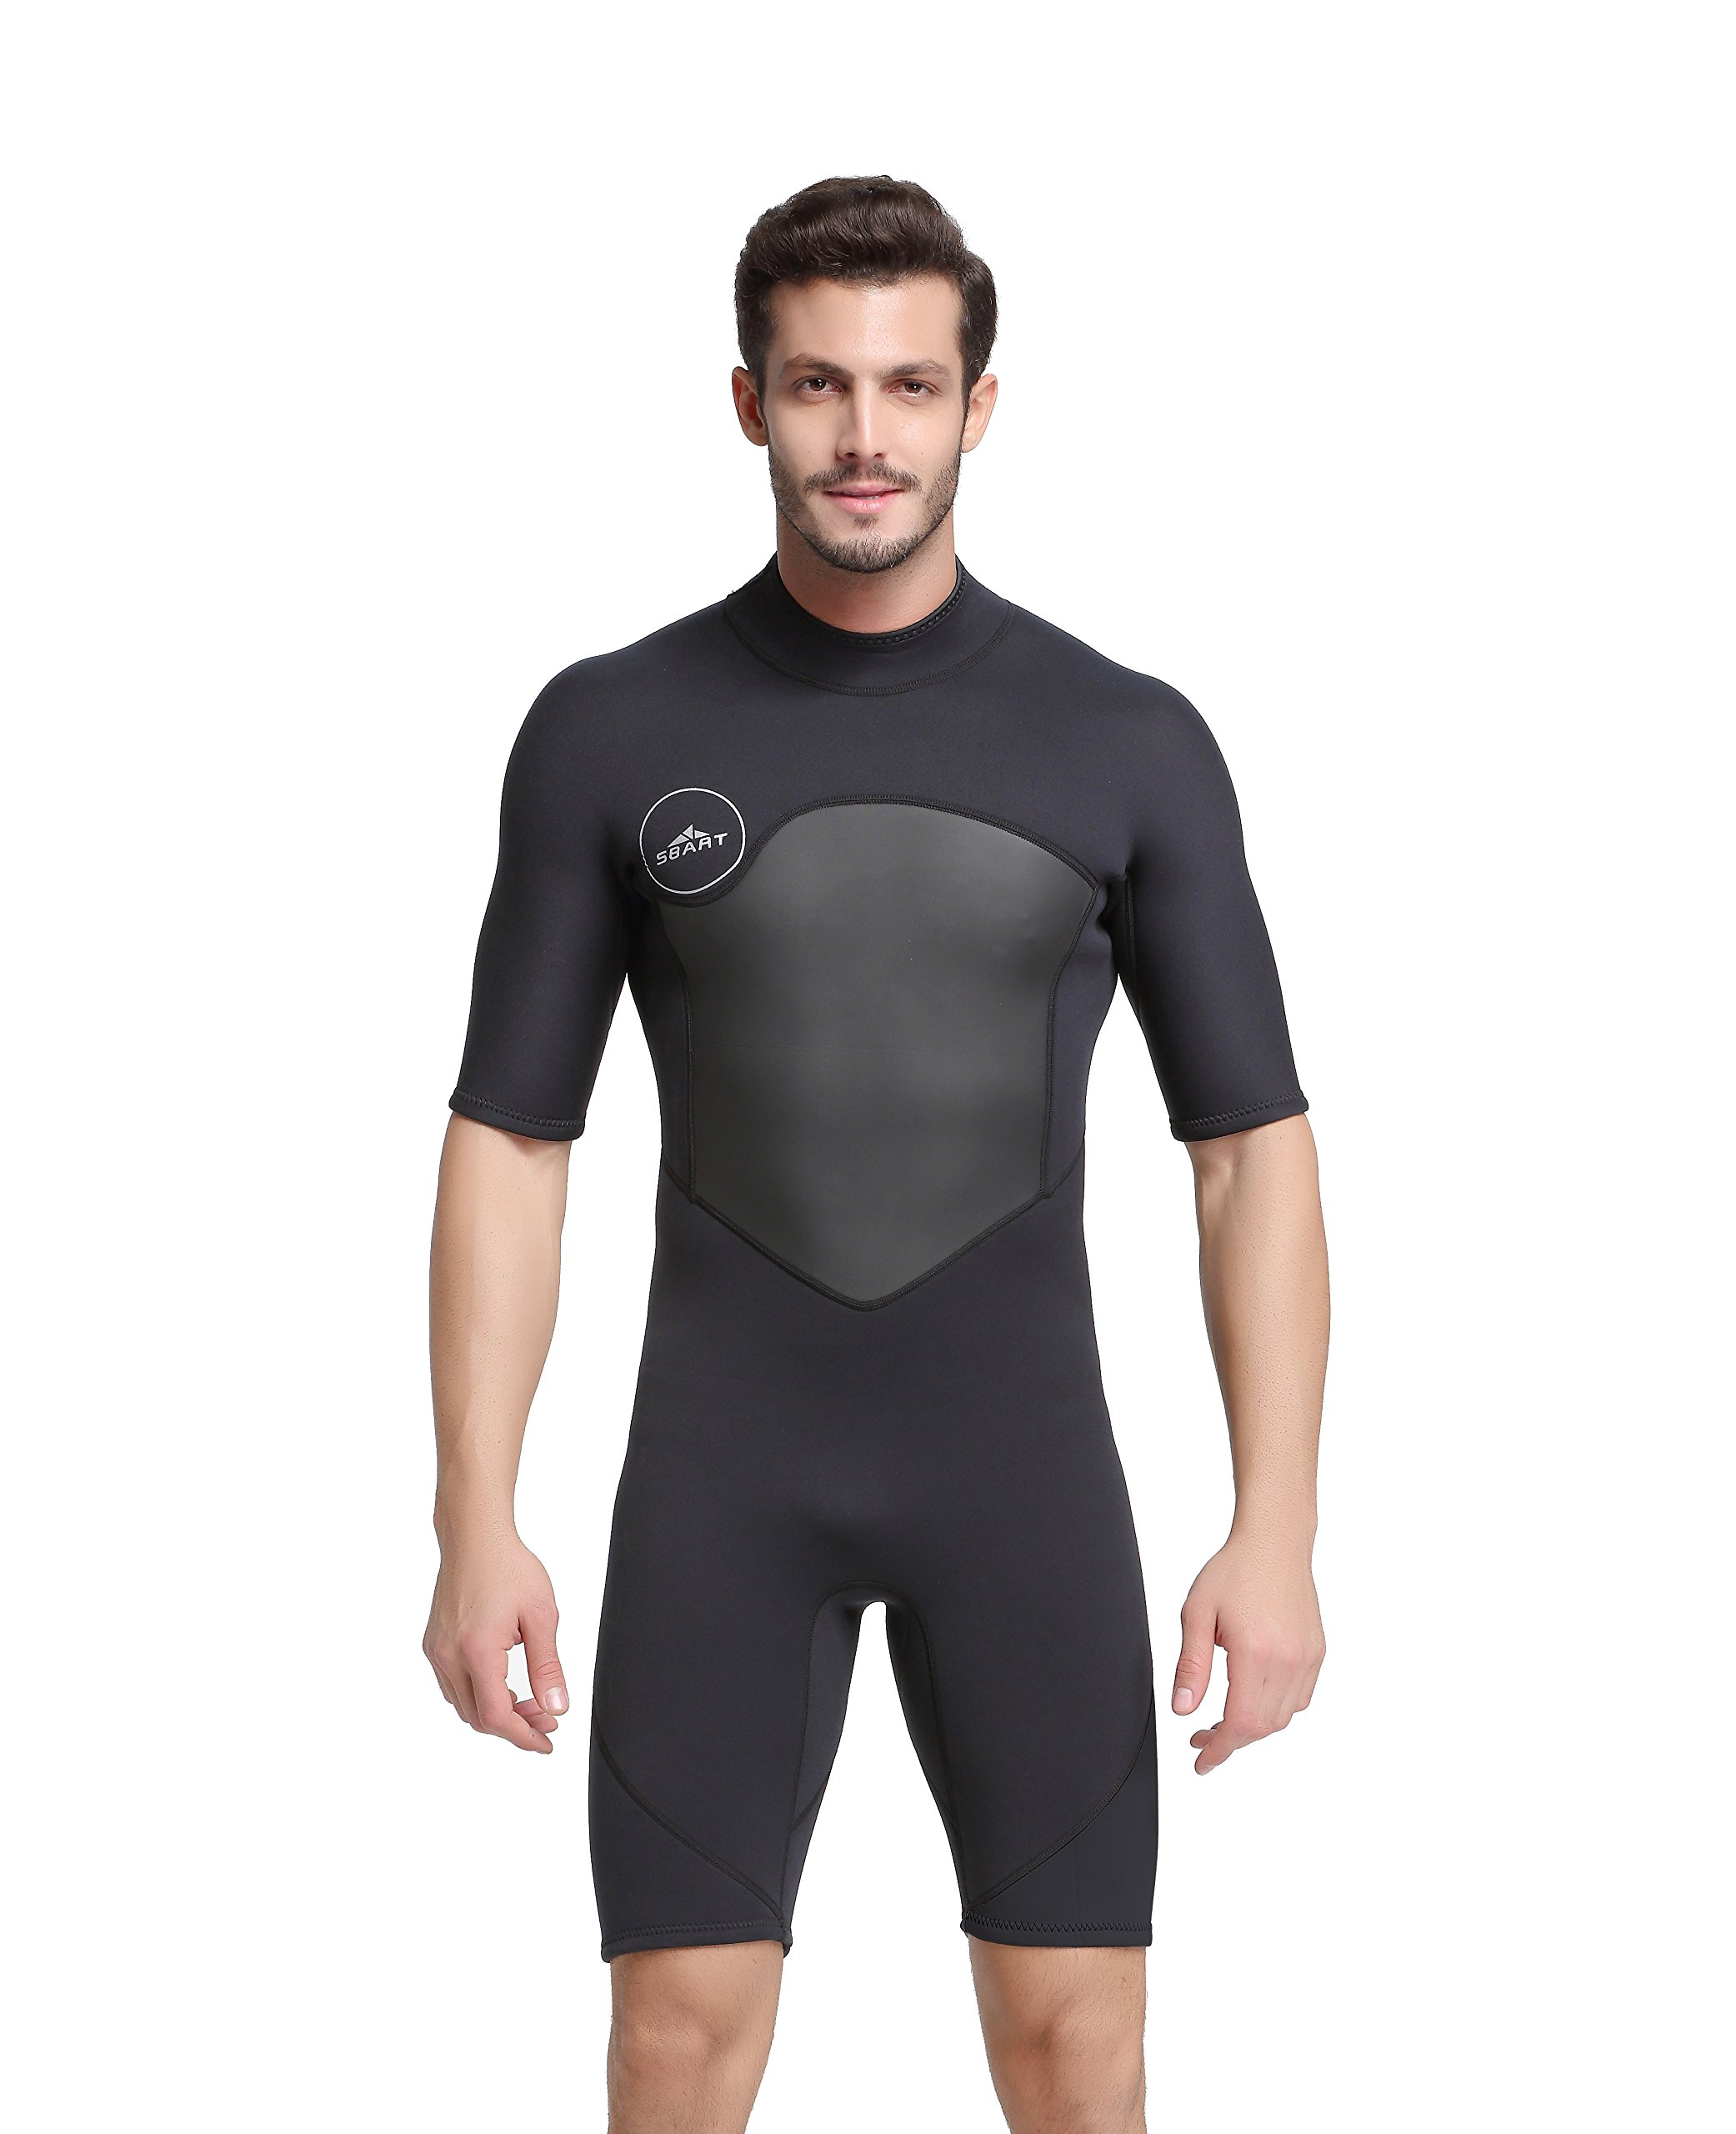 Unisex Short Sleeve 2MM Neoprene Wetsuit Men for Surfing One Piece Triathlon Scuba Diving Spearfishing Wetsuit Women Surfing (1069Black, M) by Shorty Wetsuit